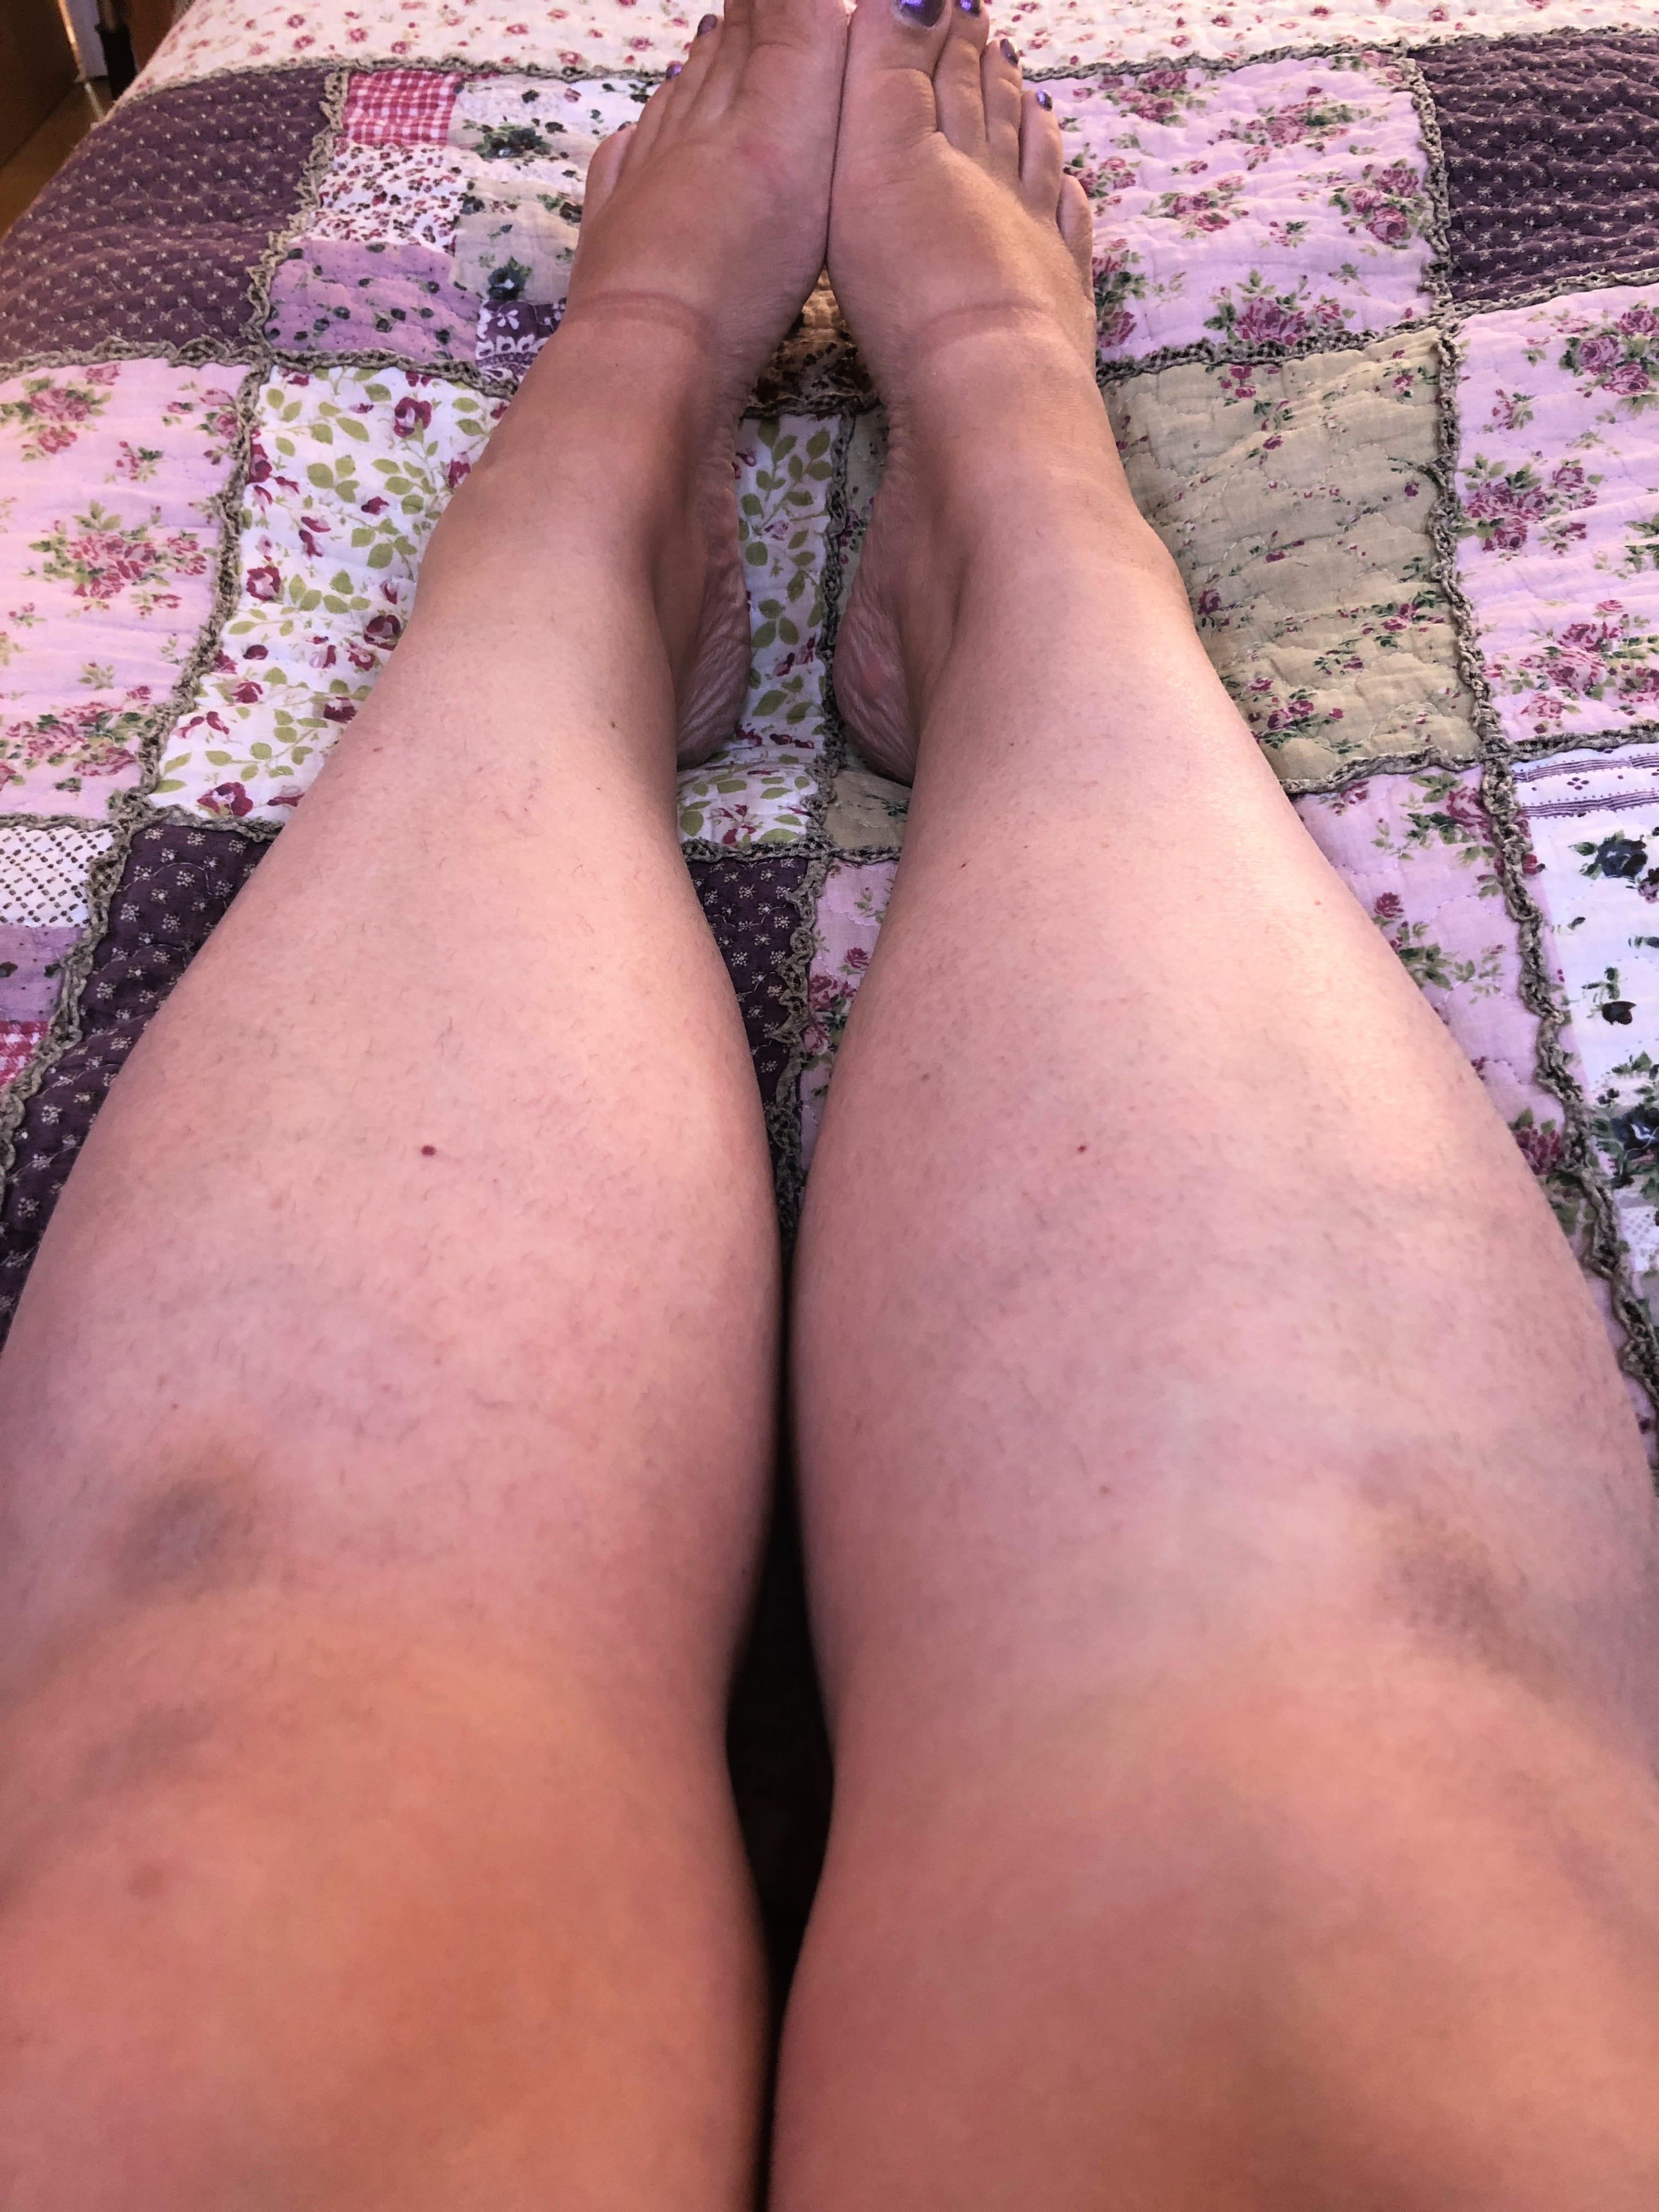 Legs August 2019